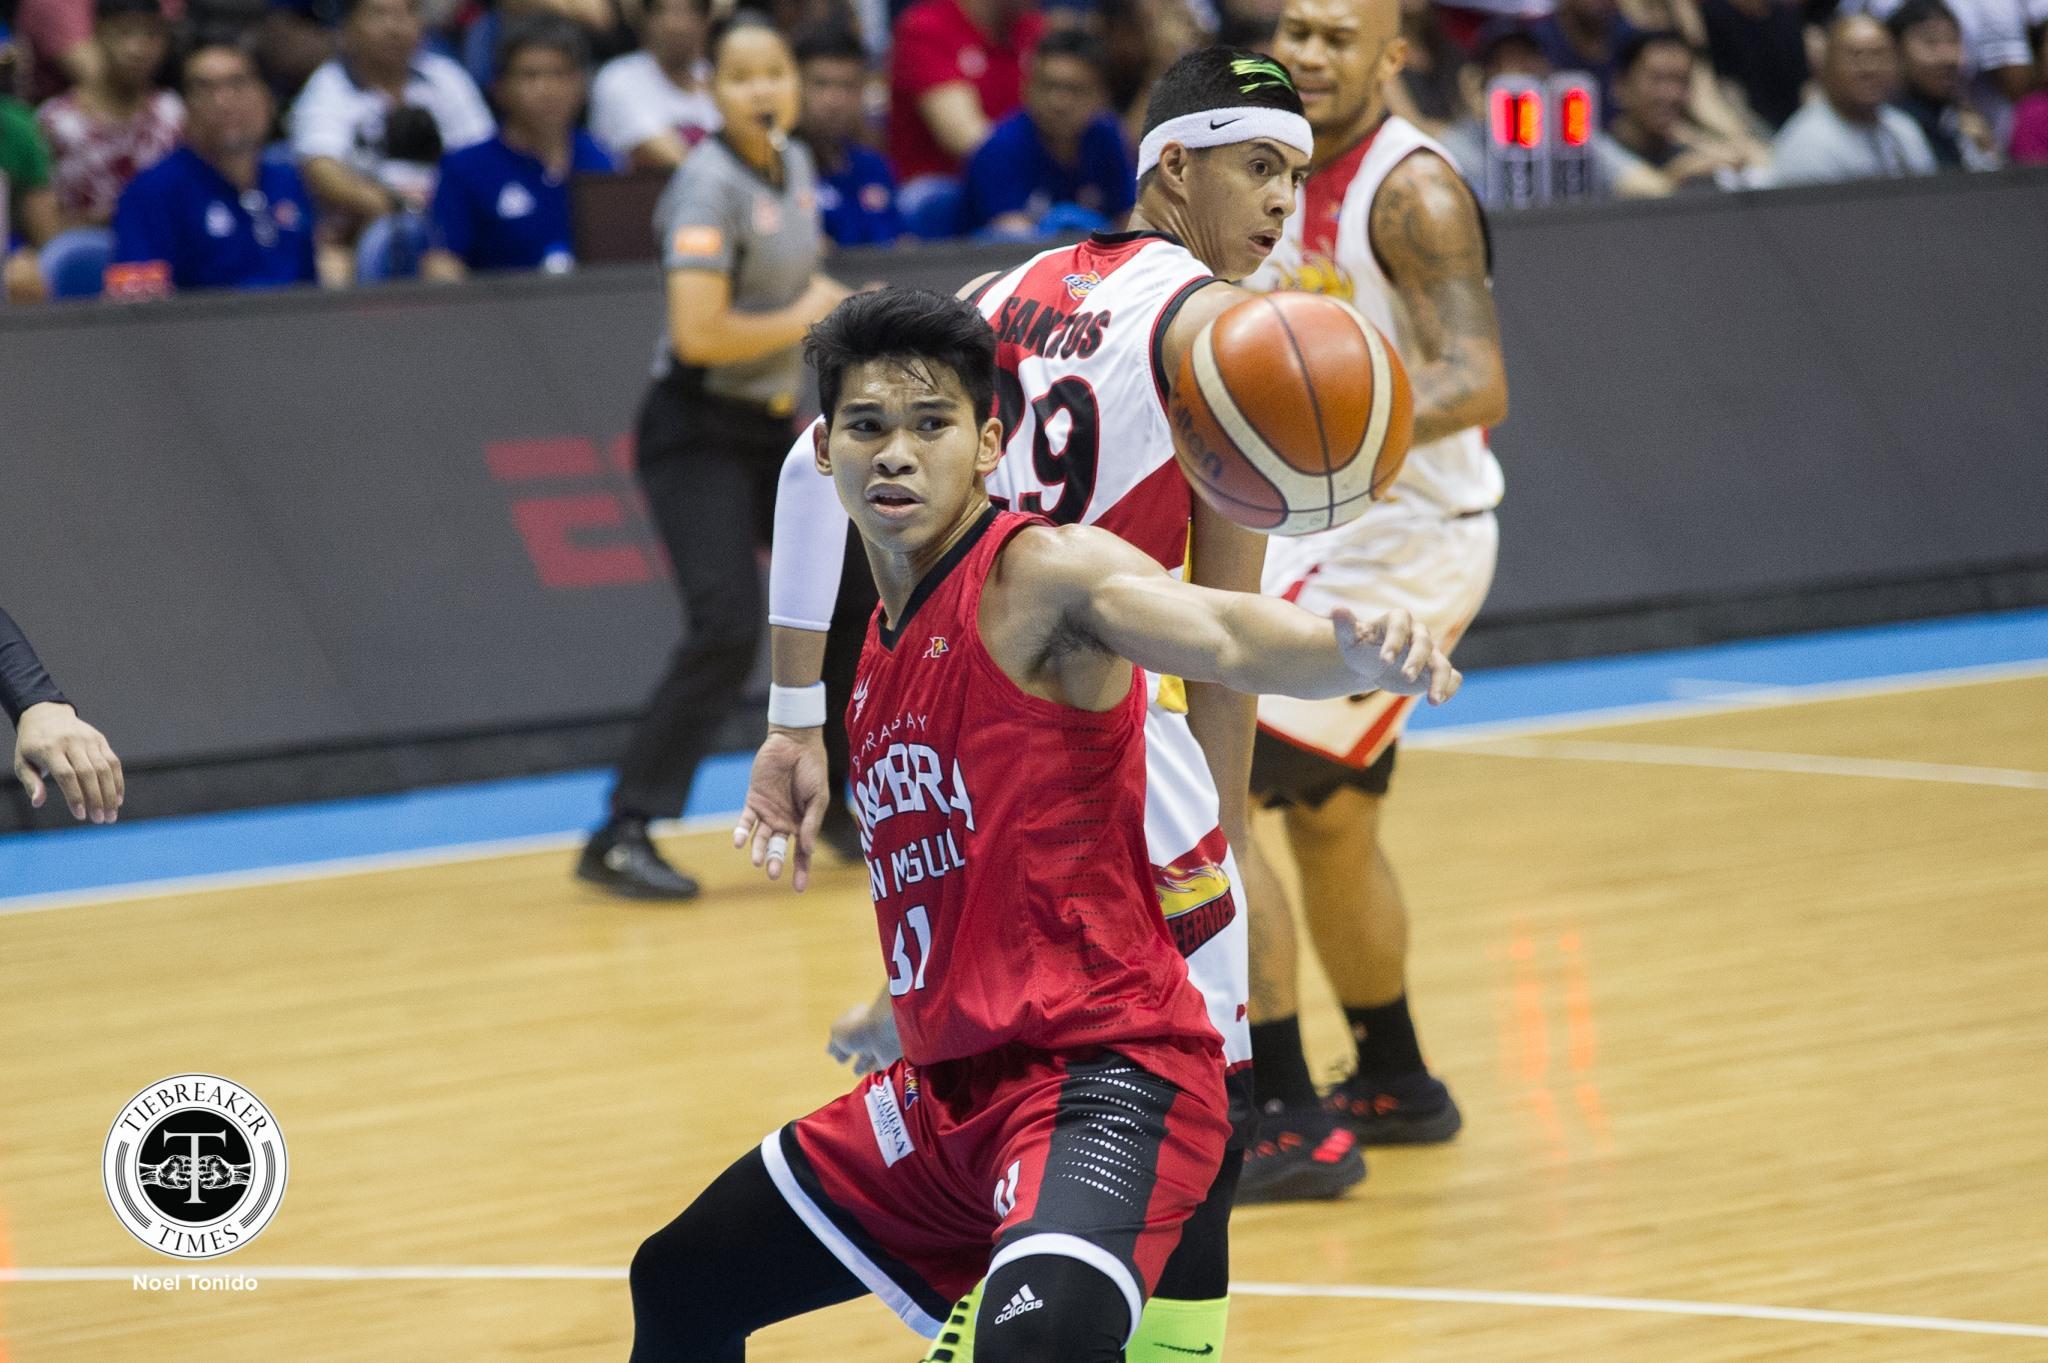 Tiebreaker Times Aljon Mariano steps up for injury-hit Ginebra Basketball News PBA  PBA Season 43 Joe Devance Barangay Ginebra San Miguel Aljon Mariano 2018 PBA Governors Cup